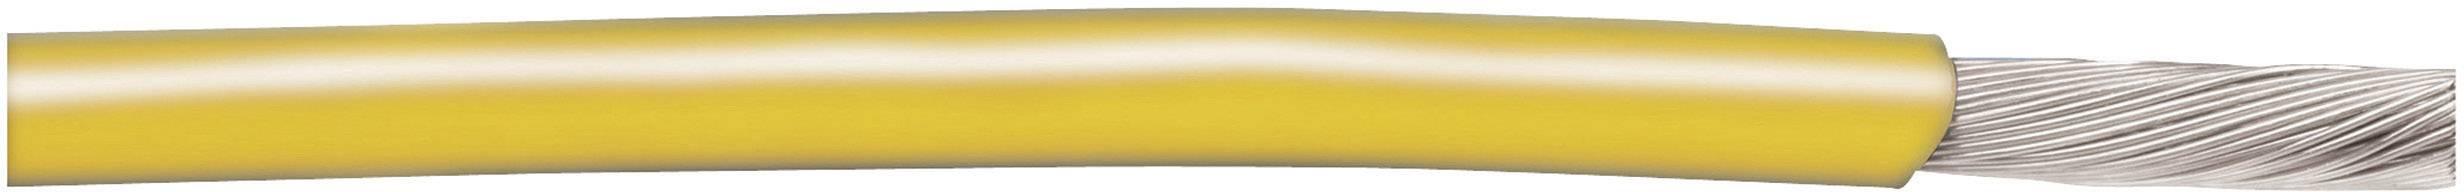 Pletenica 1 x 1.31 mm, rumena AlphaWire 3057 YL001 cena za meter